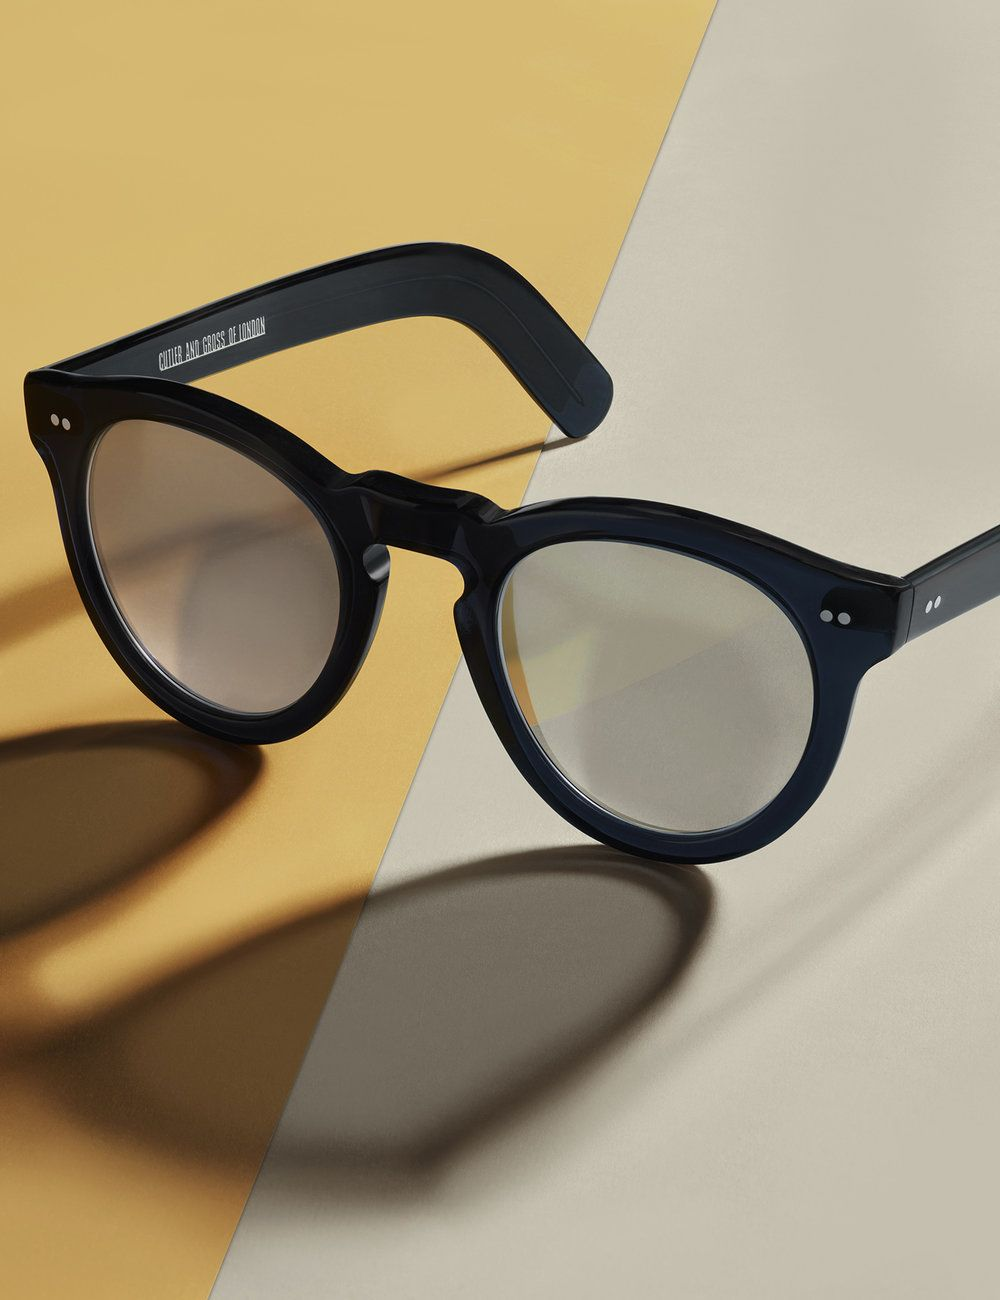 61313f2fbe8 Sunglasses by London product photographer Josh Caudwell